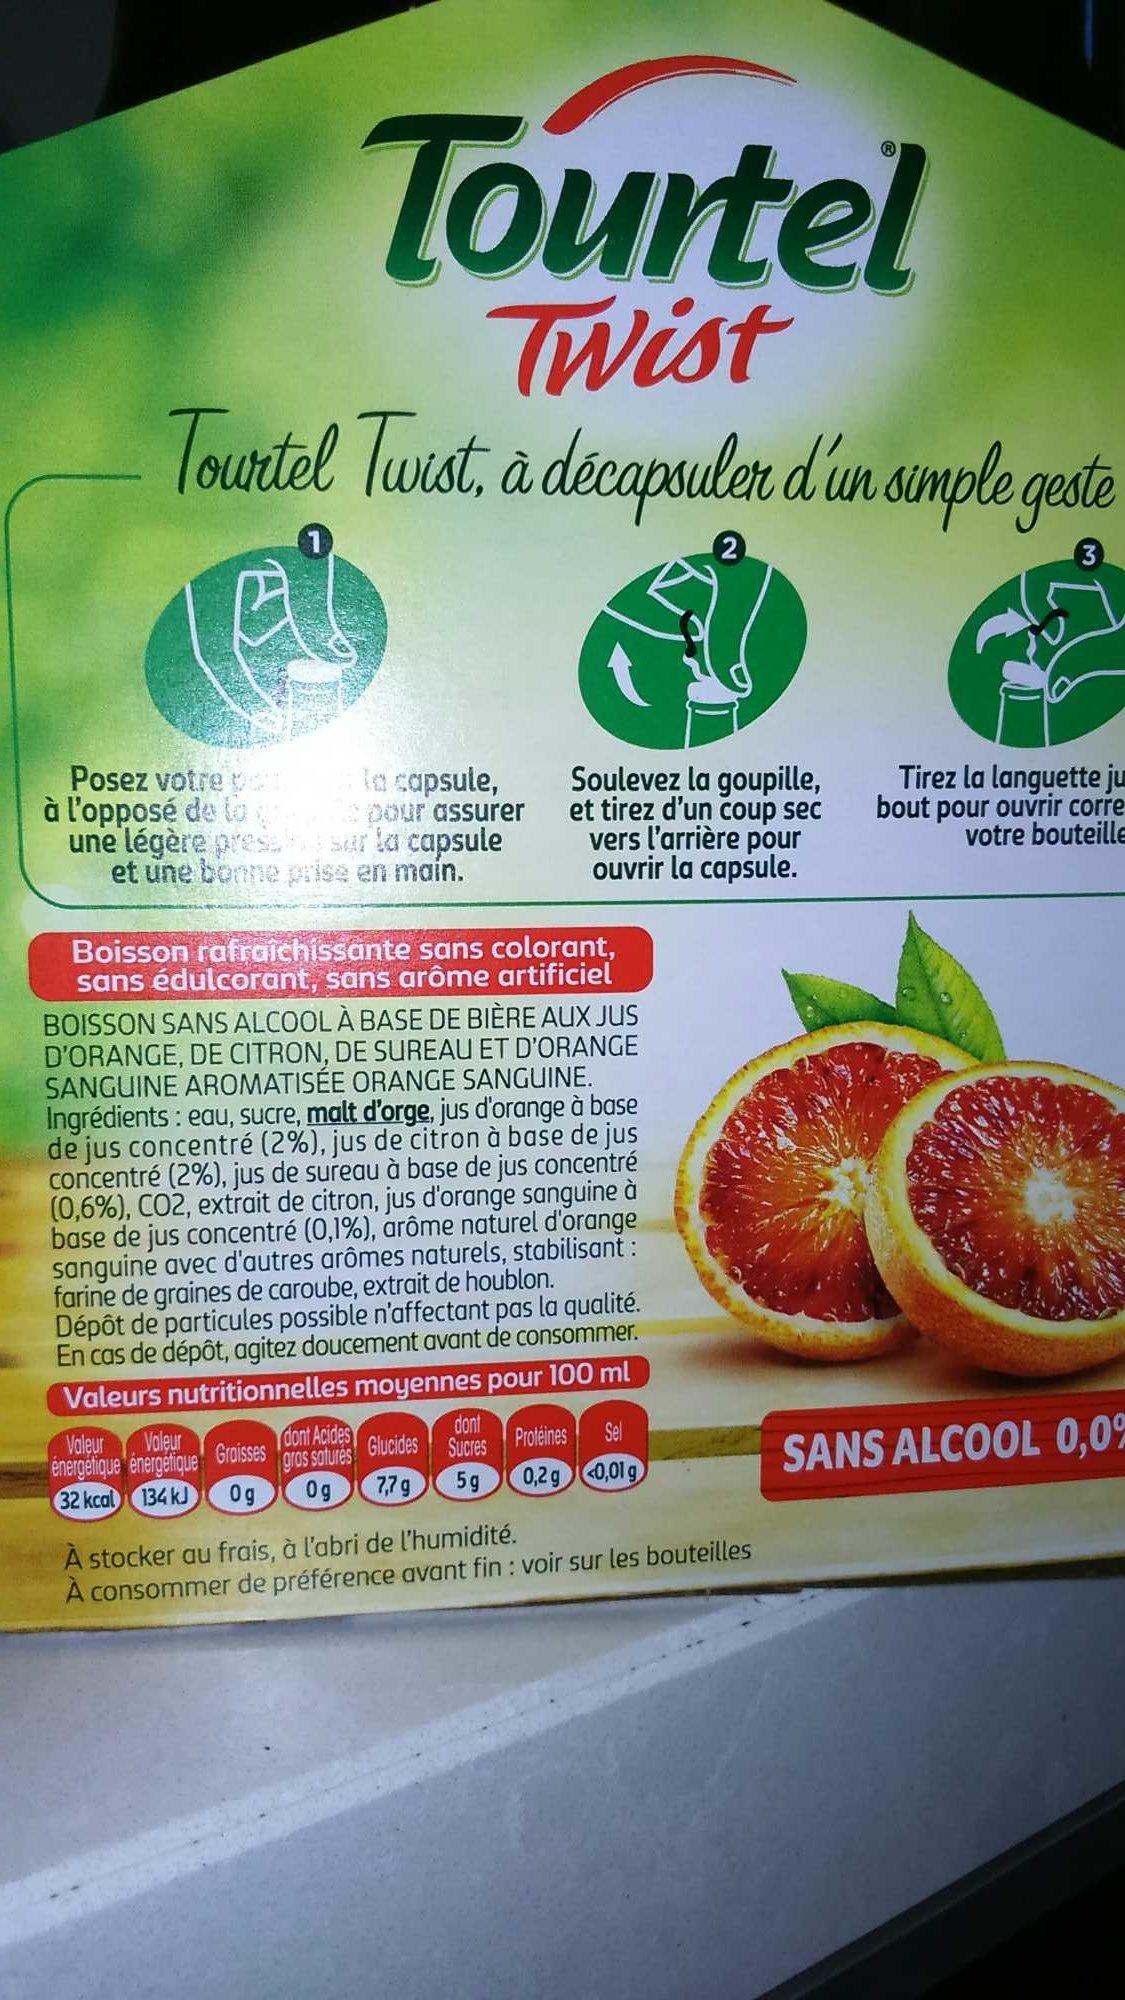 Tourtel - 6x27,5cl tourtel twist ora sanguine - 0.00 degre alcool - Produit - fr